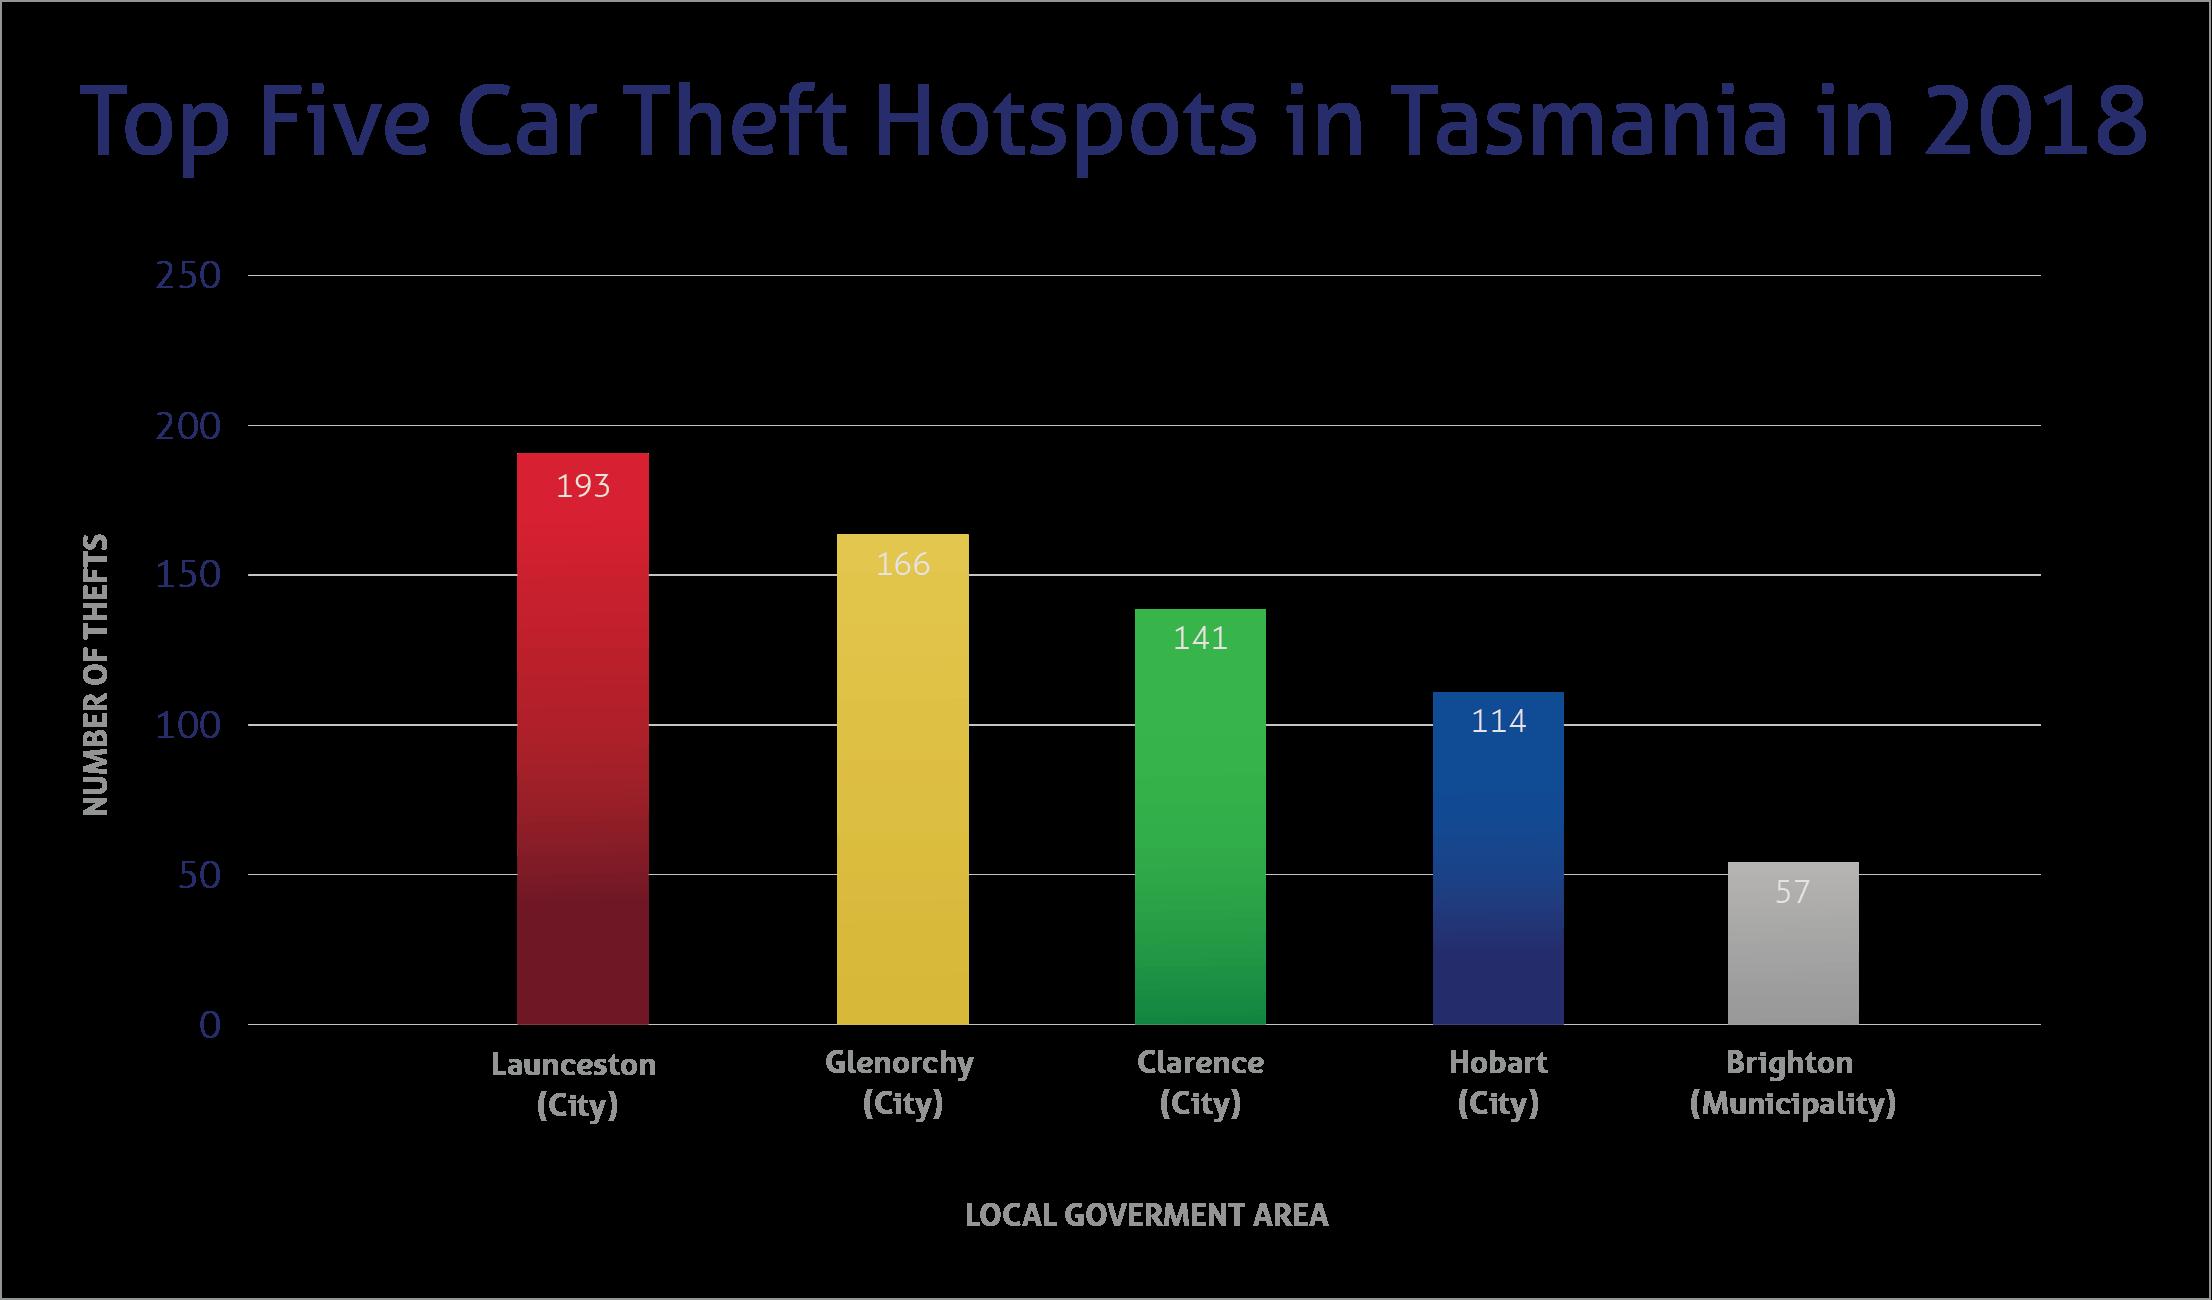 Top car theft hotspots in Tasmania 2018